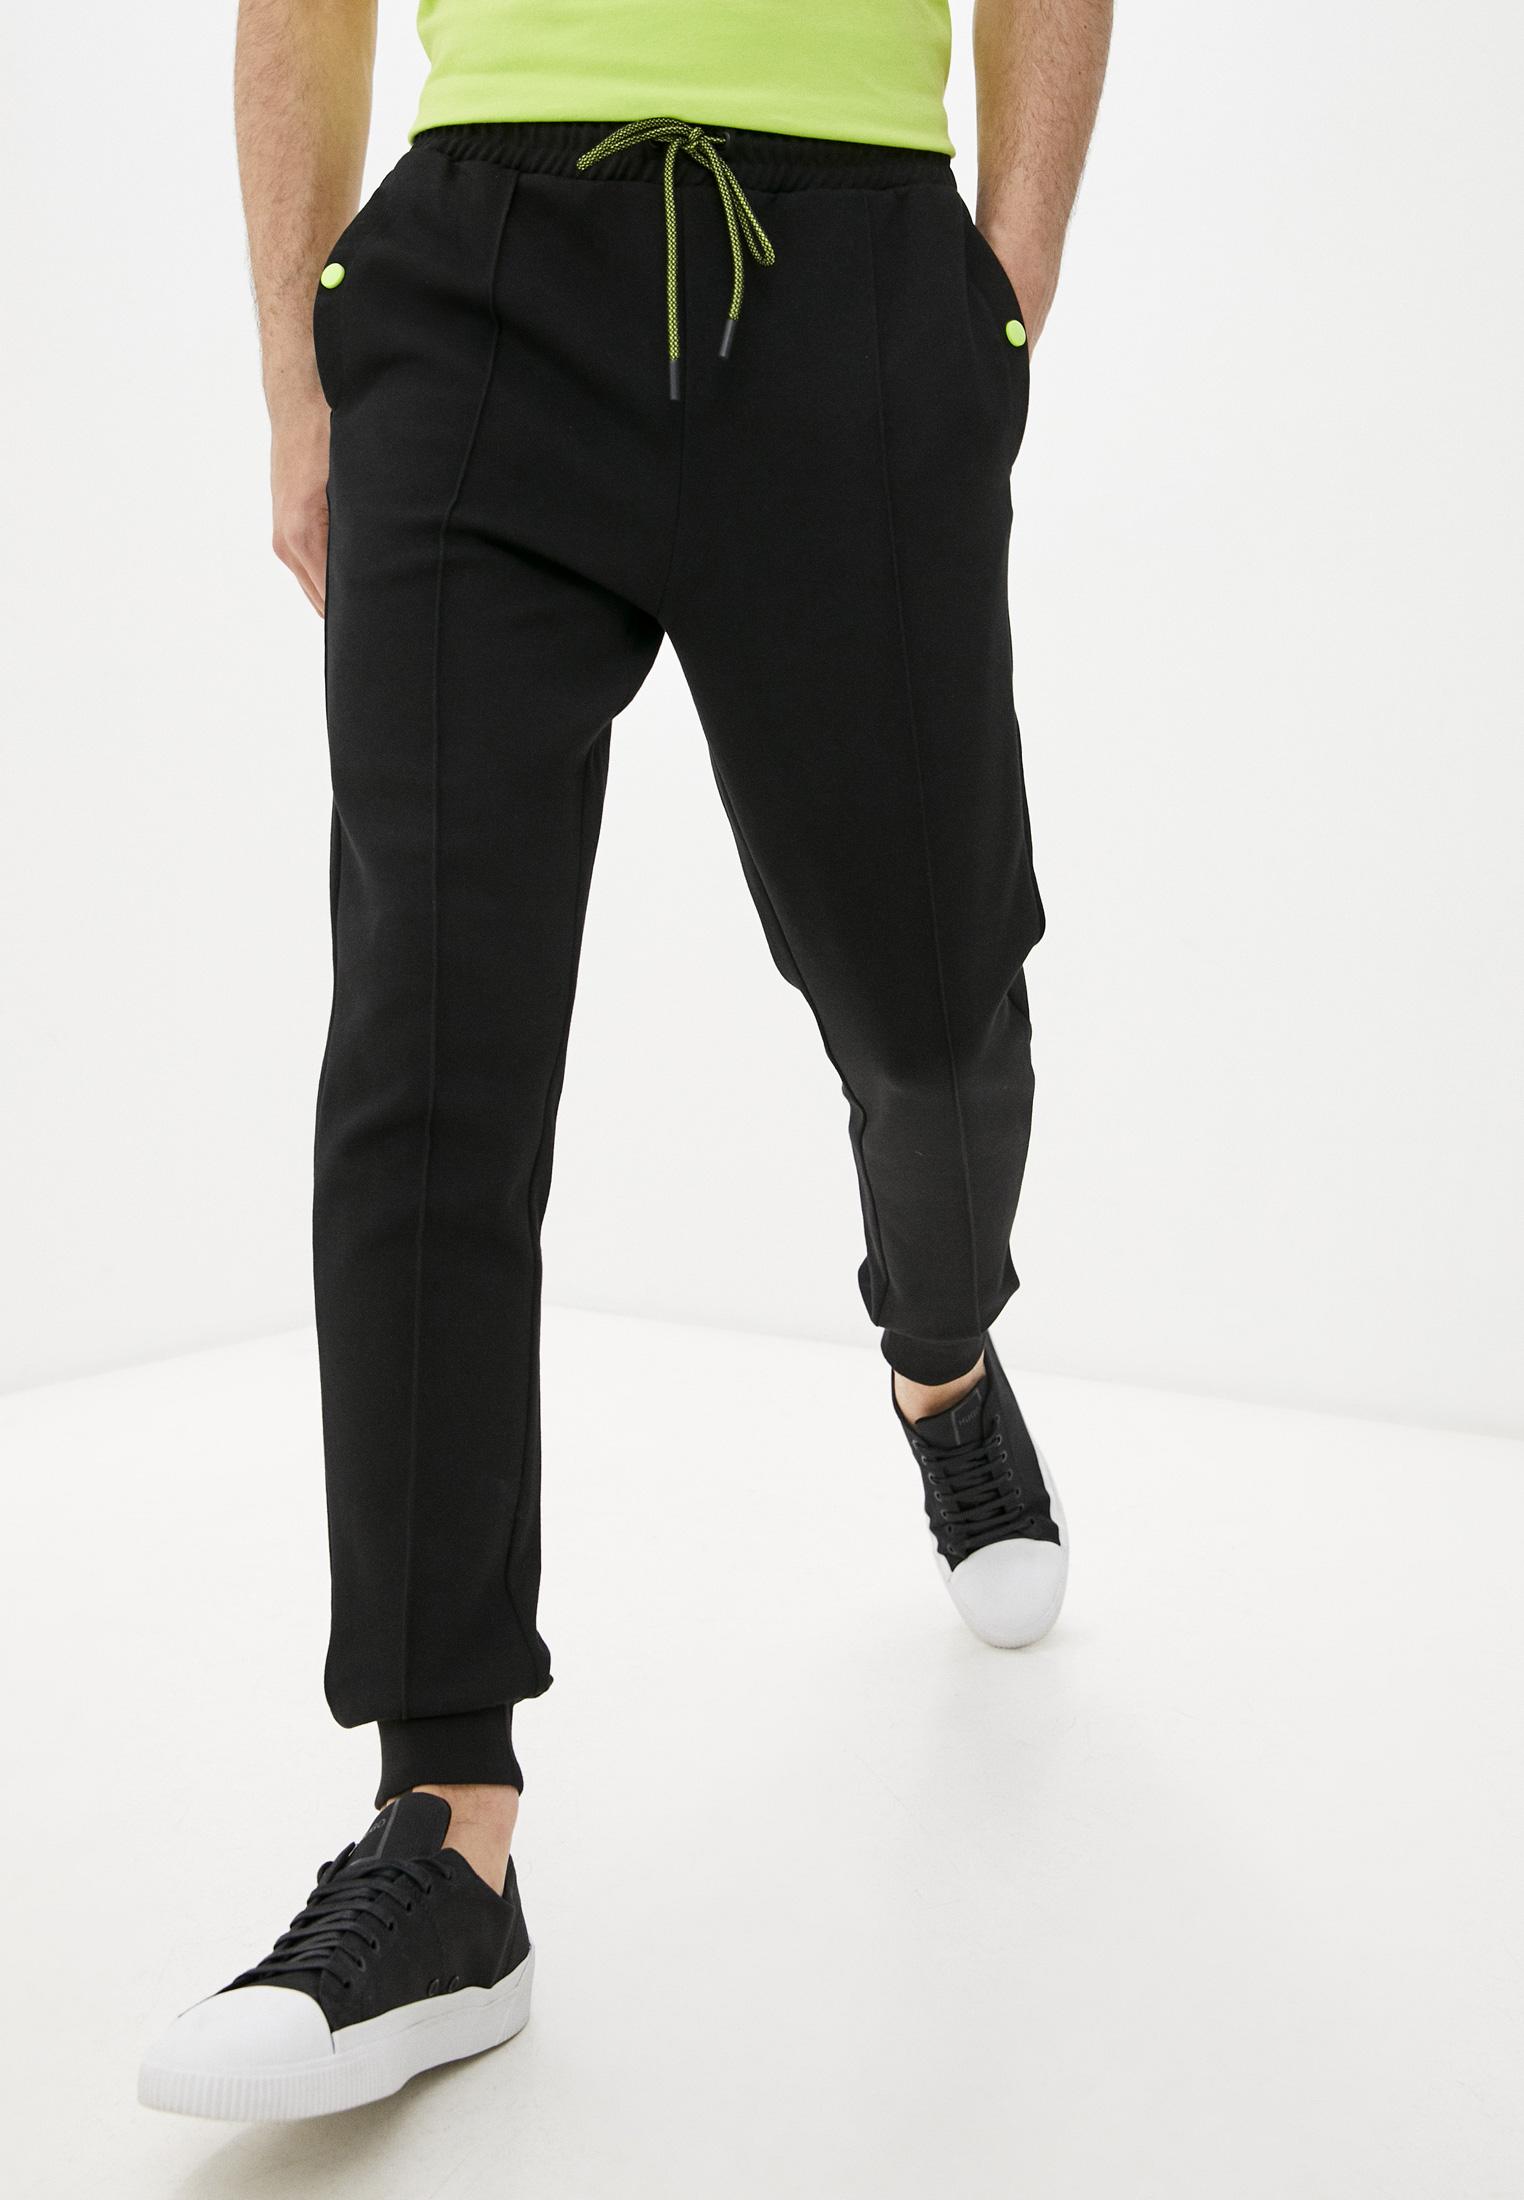 Мужские спортивные брюки Bikkembergs (Биккембергс) C 1 187 01 M 4172